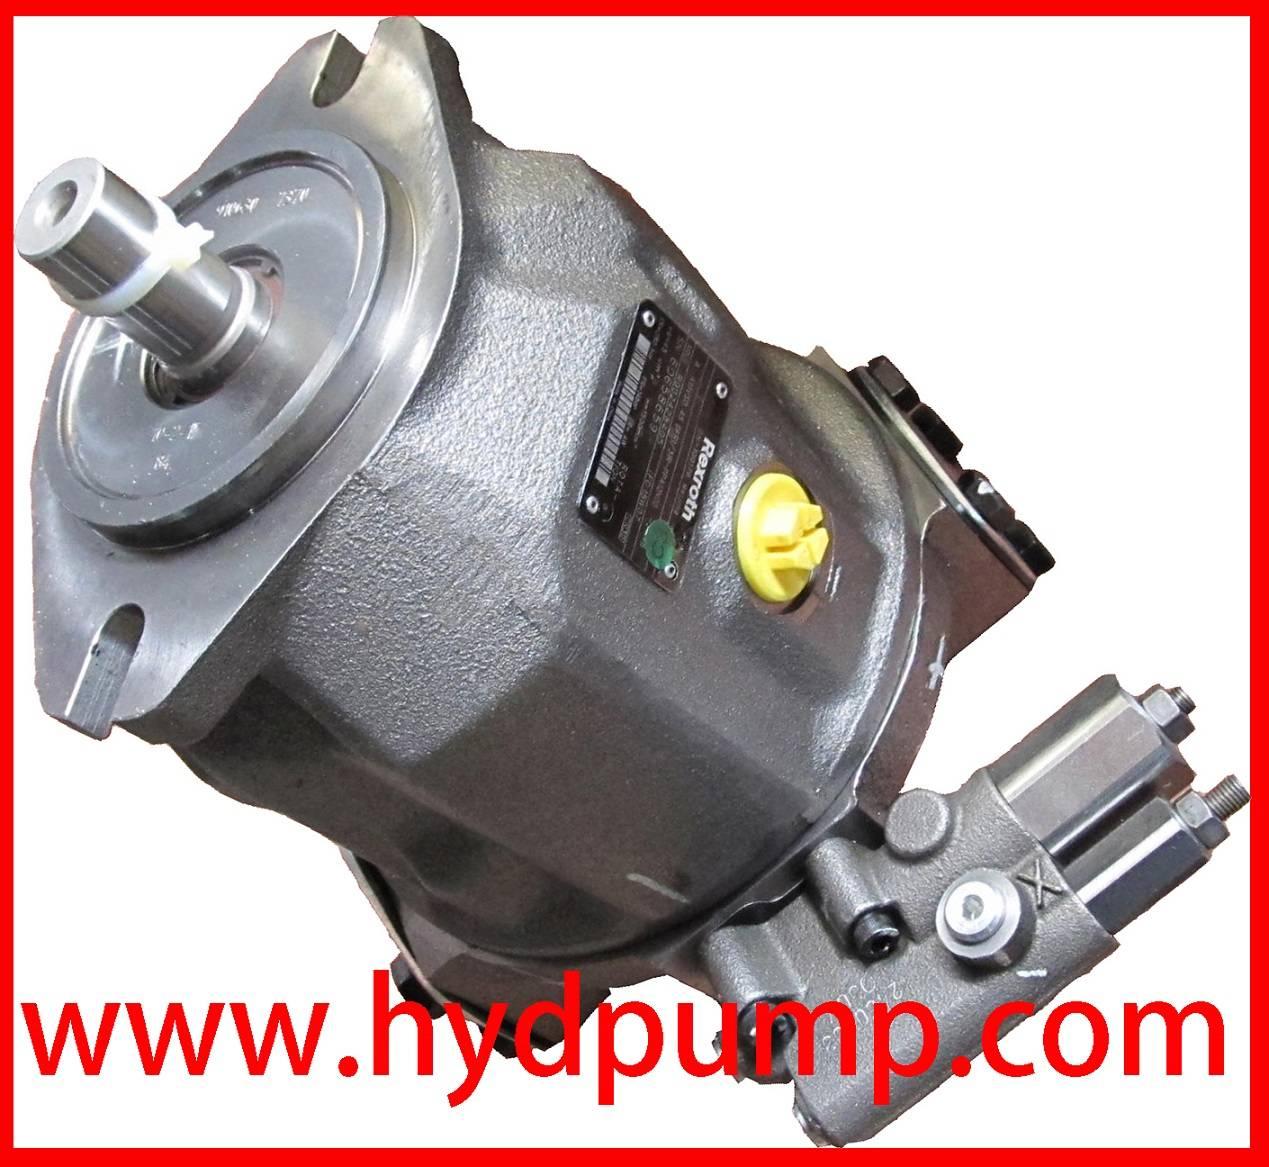 Brueninghaus Hydromatik Rexroth A10VSO hydraulic pump